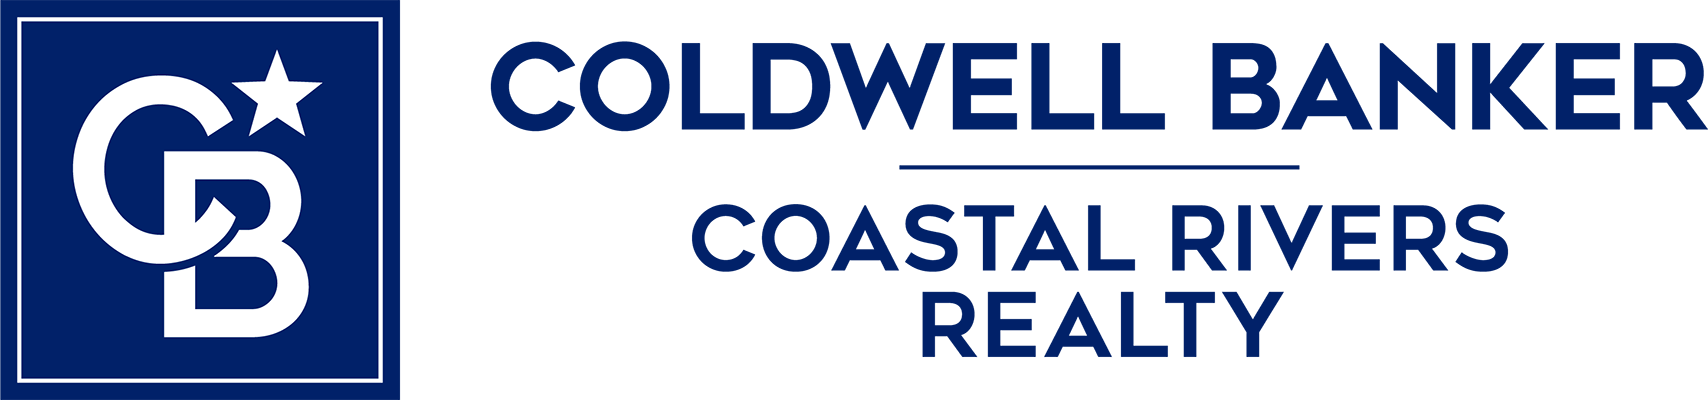 John Easterling - Coldwell Banker Coastal Rivers Logo